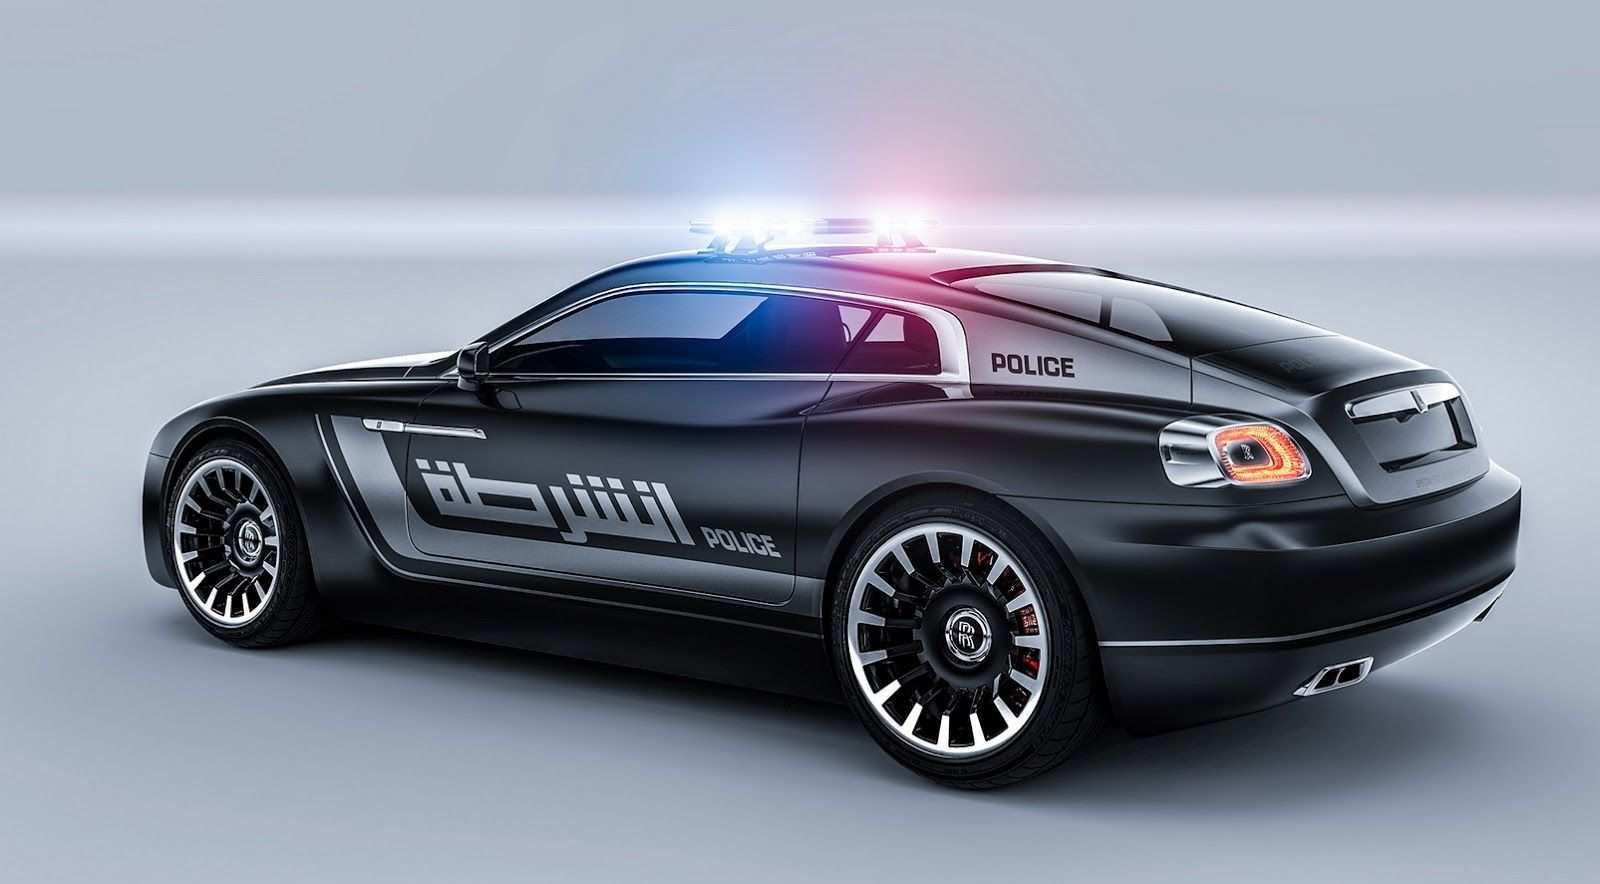 20 New 2020 Rolls Royce Wraith Exterior and Interior with 2020 Rolls Royce Wraith